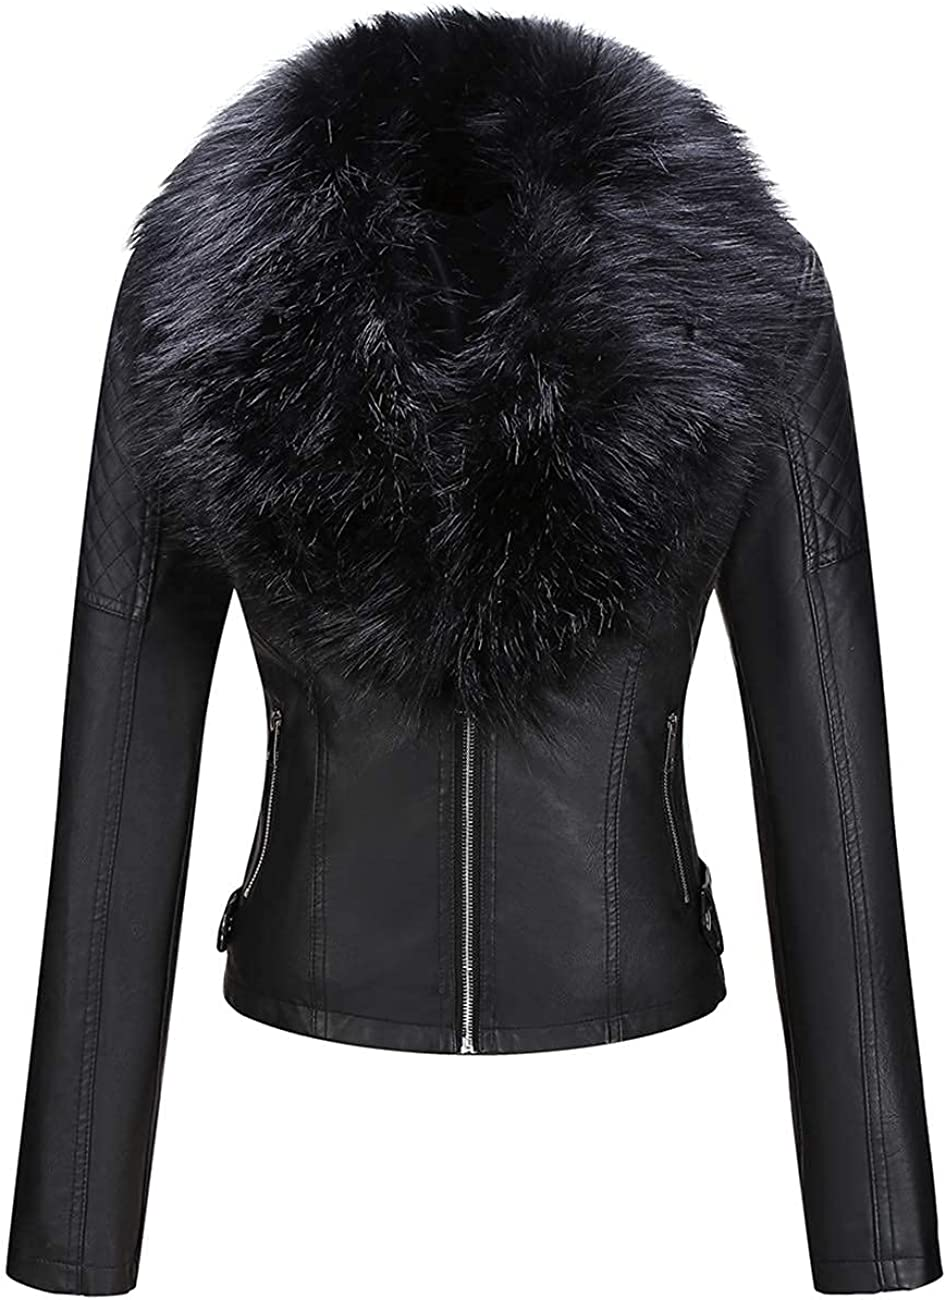 Giolshon Women's Faux Suede Jacket Motorcycle Short Coat with Detachable Faux Fur Collar